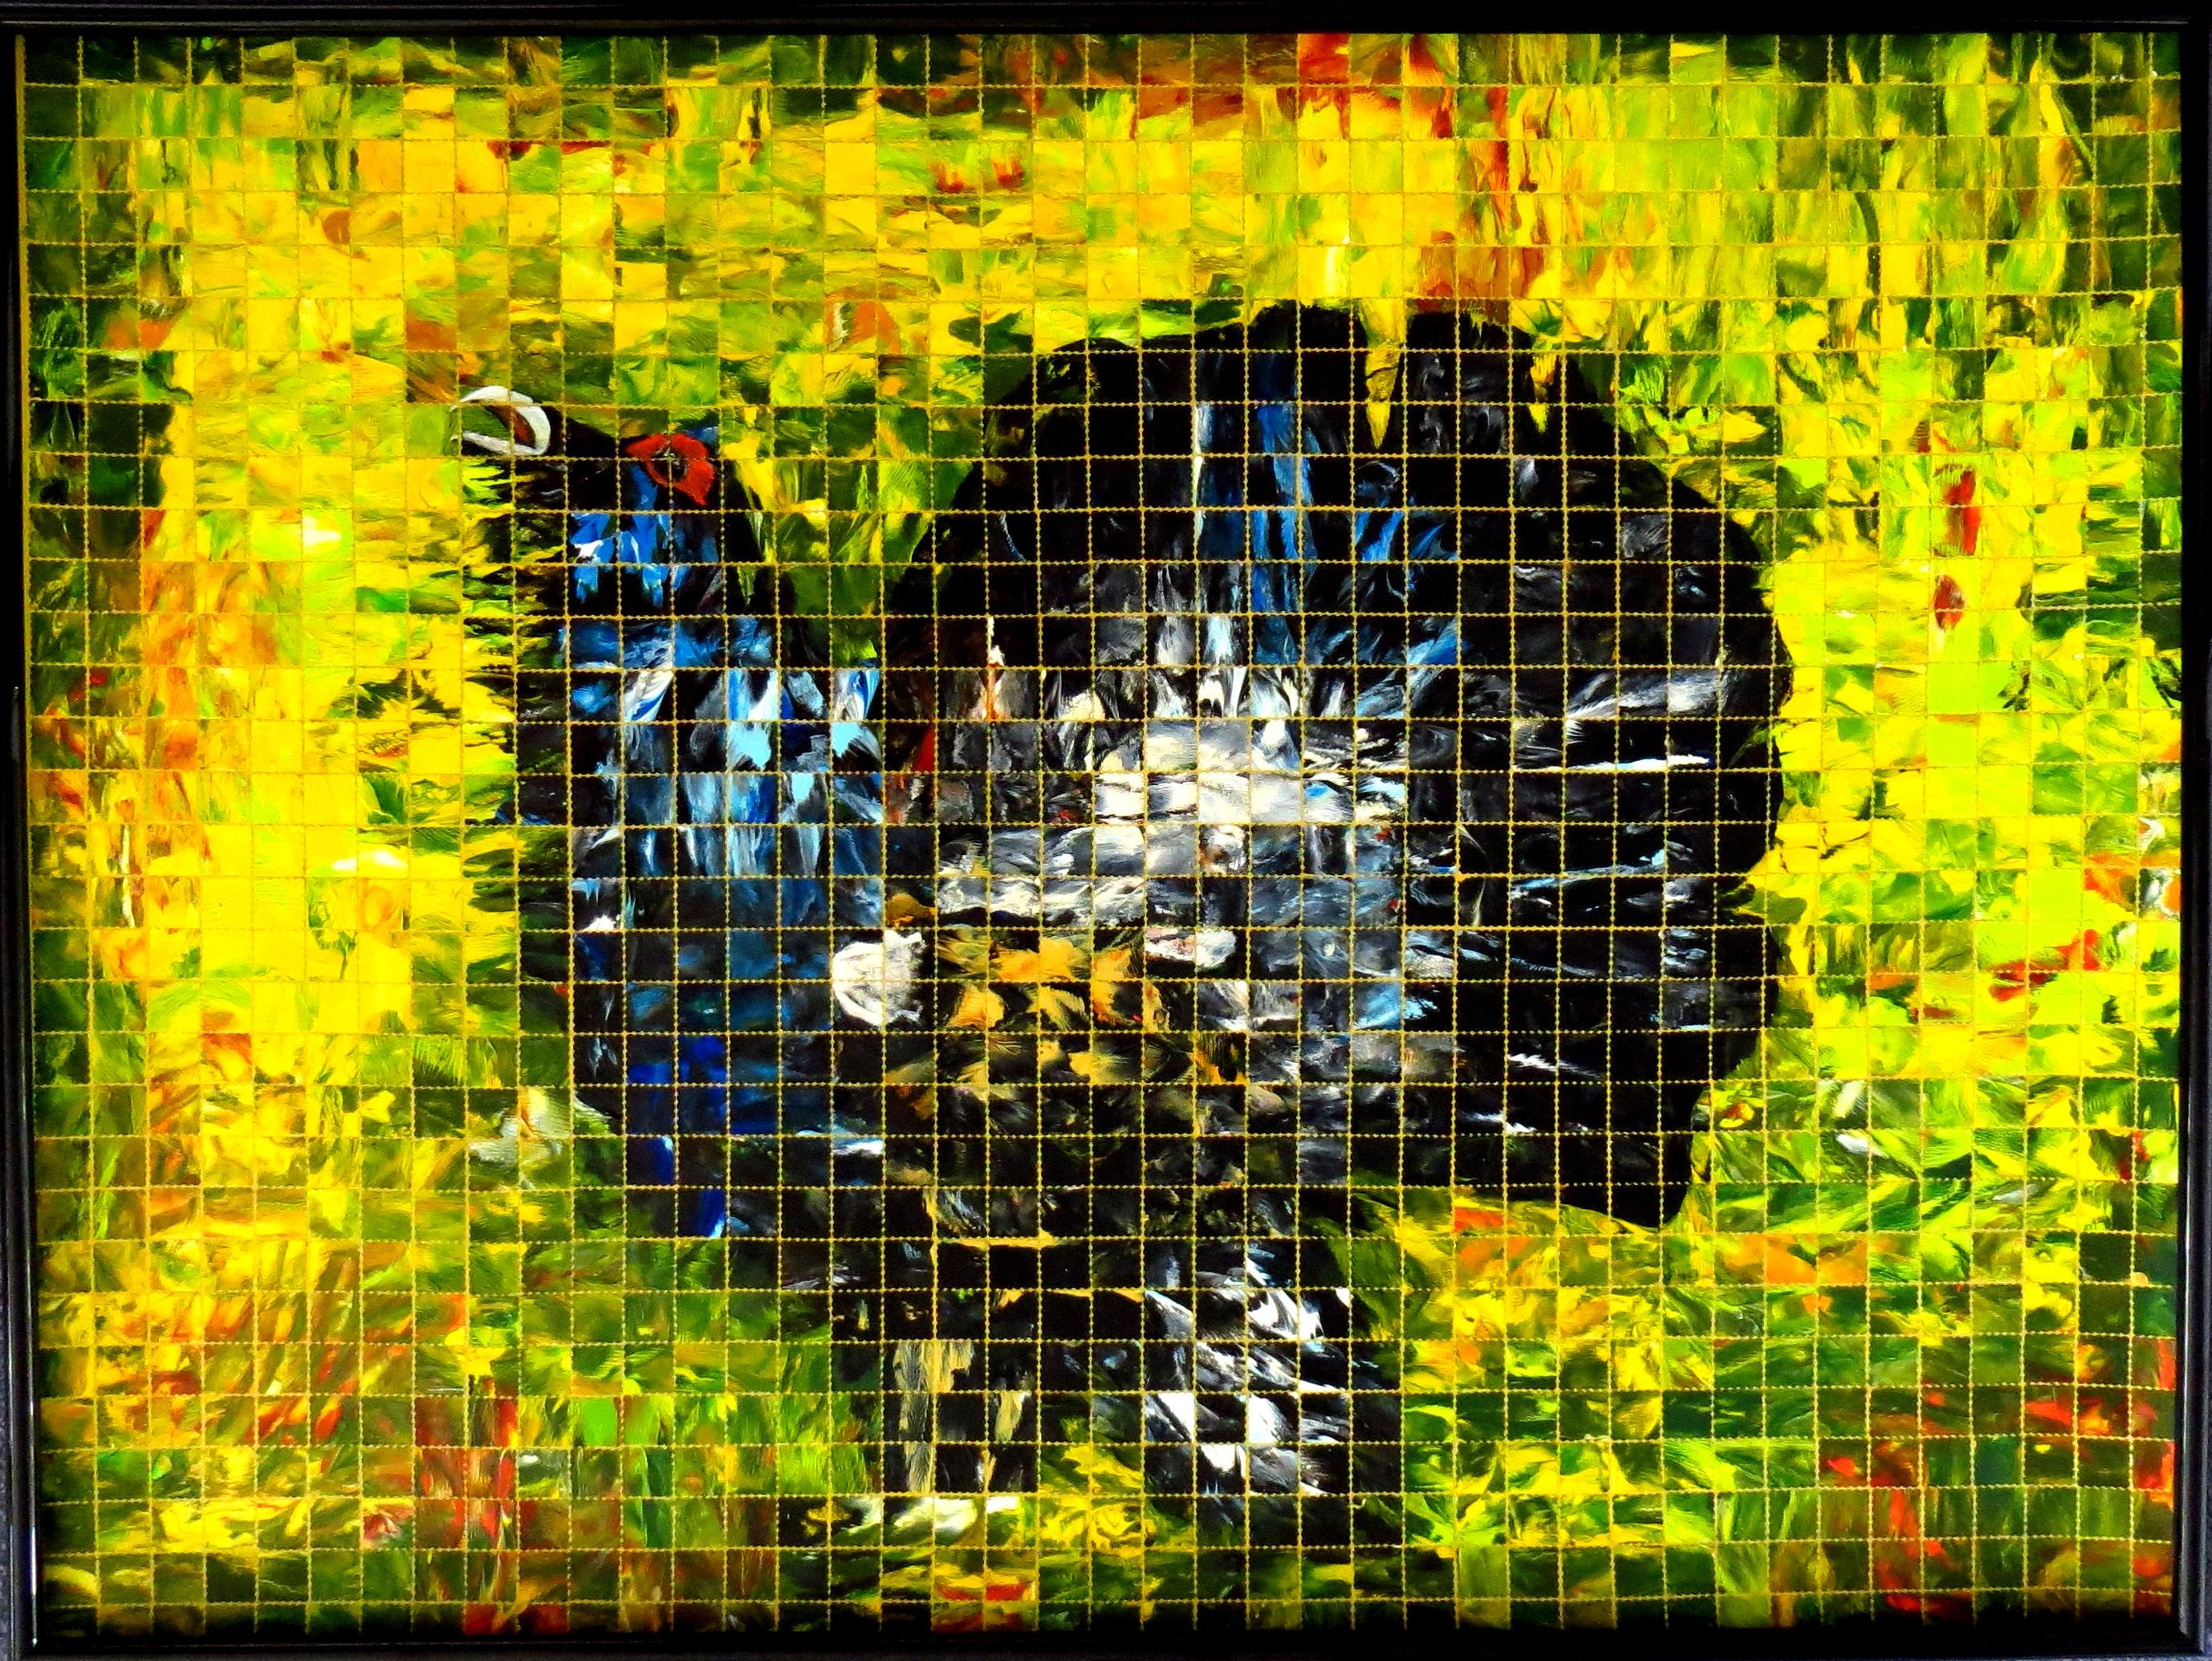 Balzender Auerhahn (60x80) Art in Art